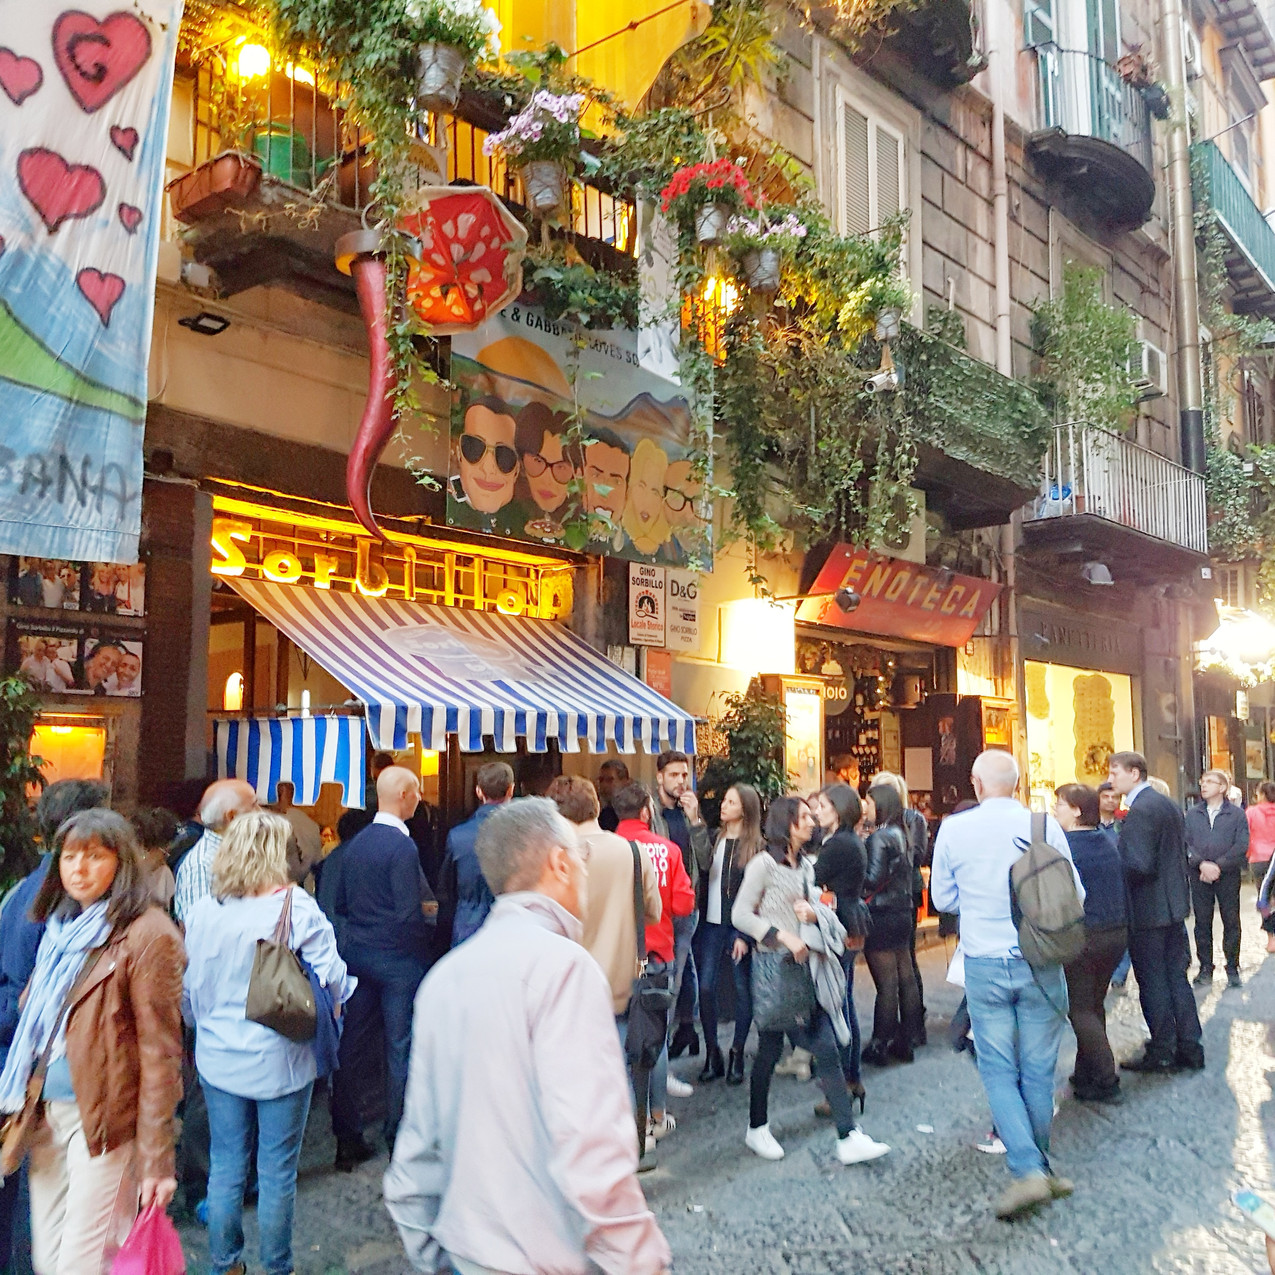 Famous pizza restaurant in Napoli.